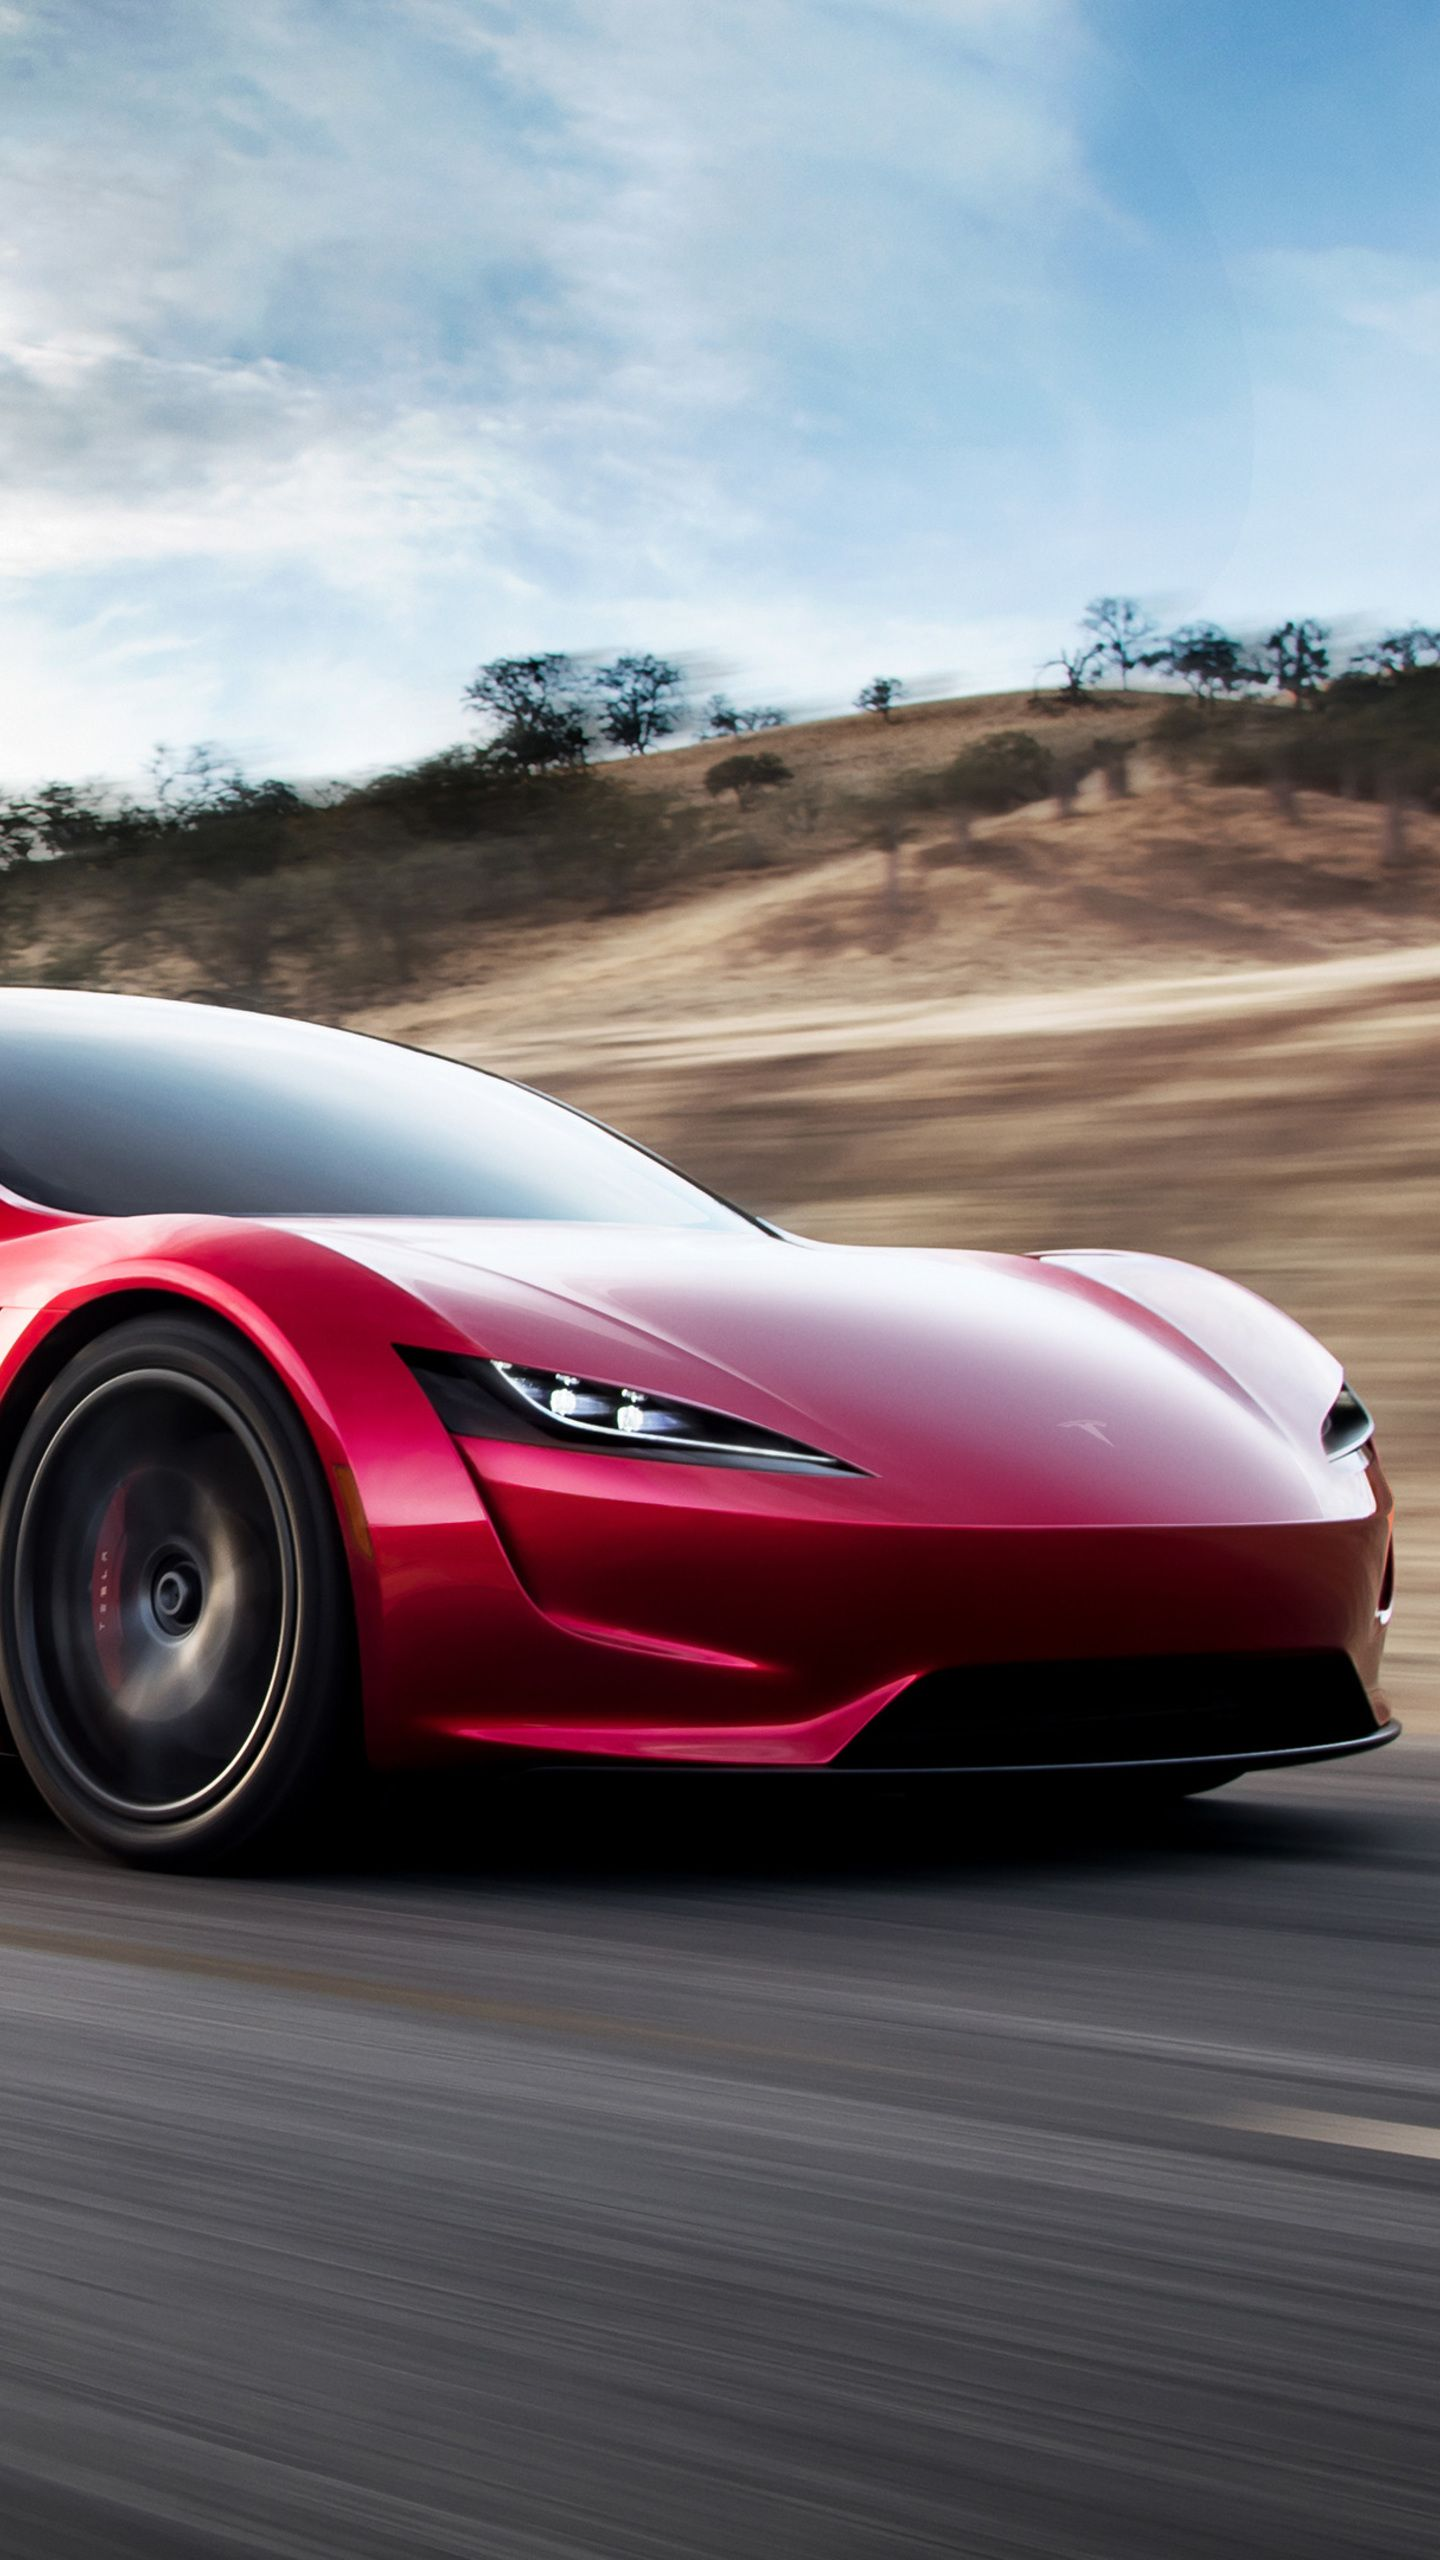 Tesla Roadster Wallpaper Widescreen ydR · Cars Desktop HD